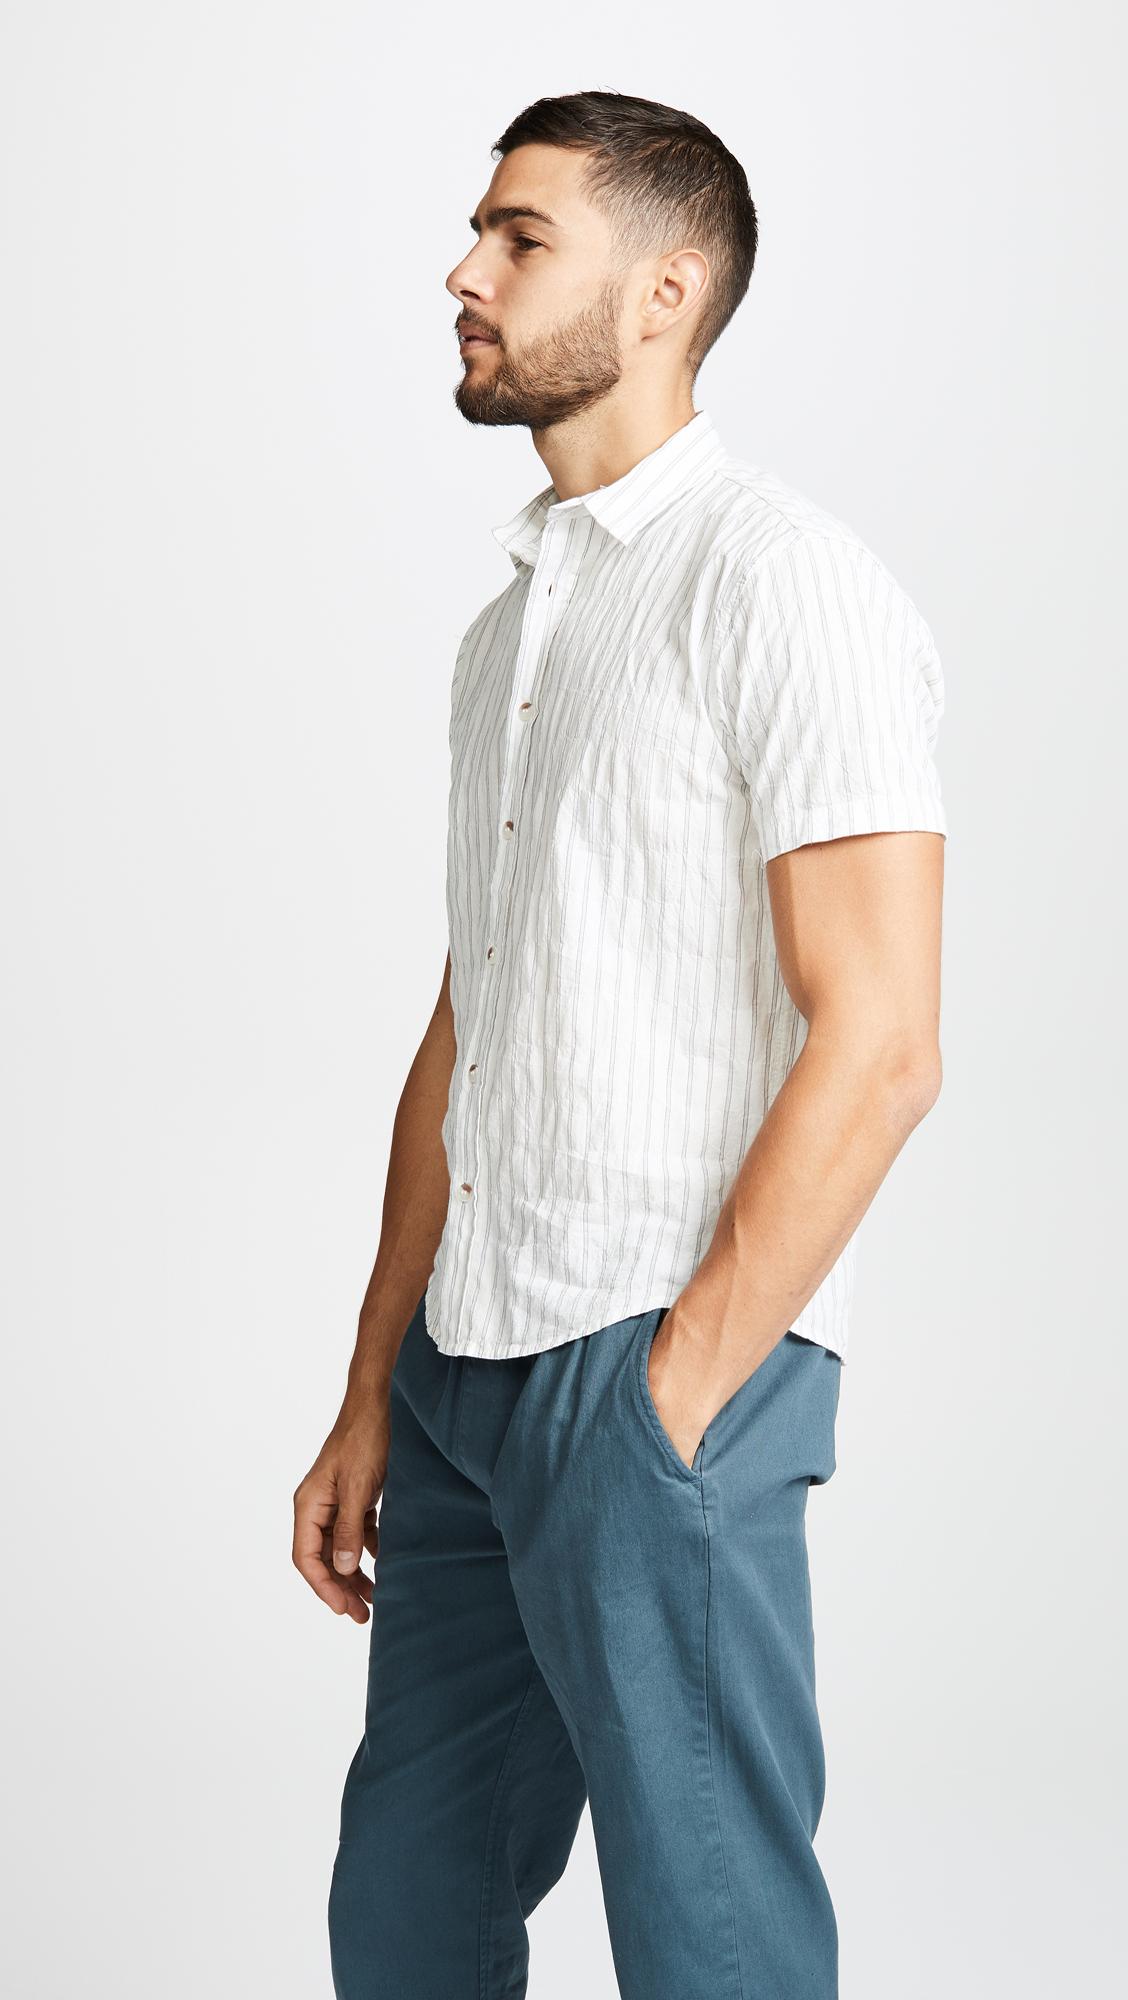 c10c4556c619 Mollusk Summer Shirt